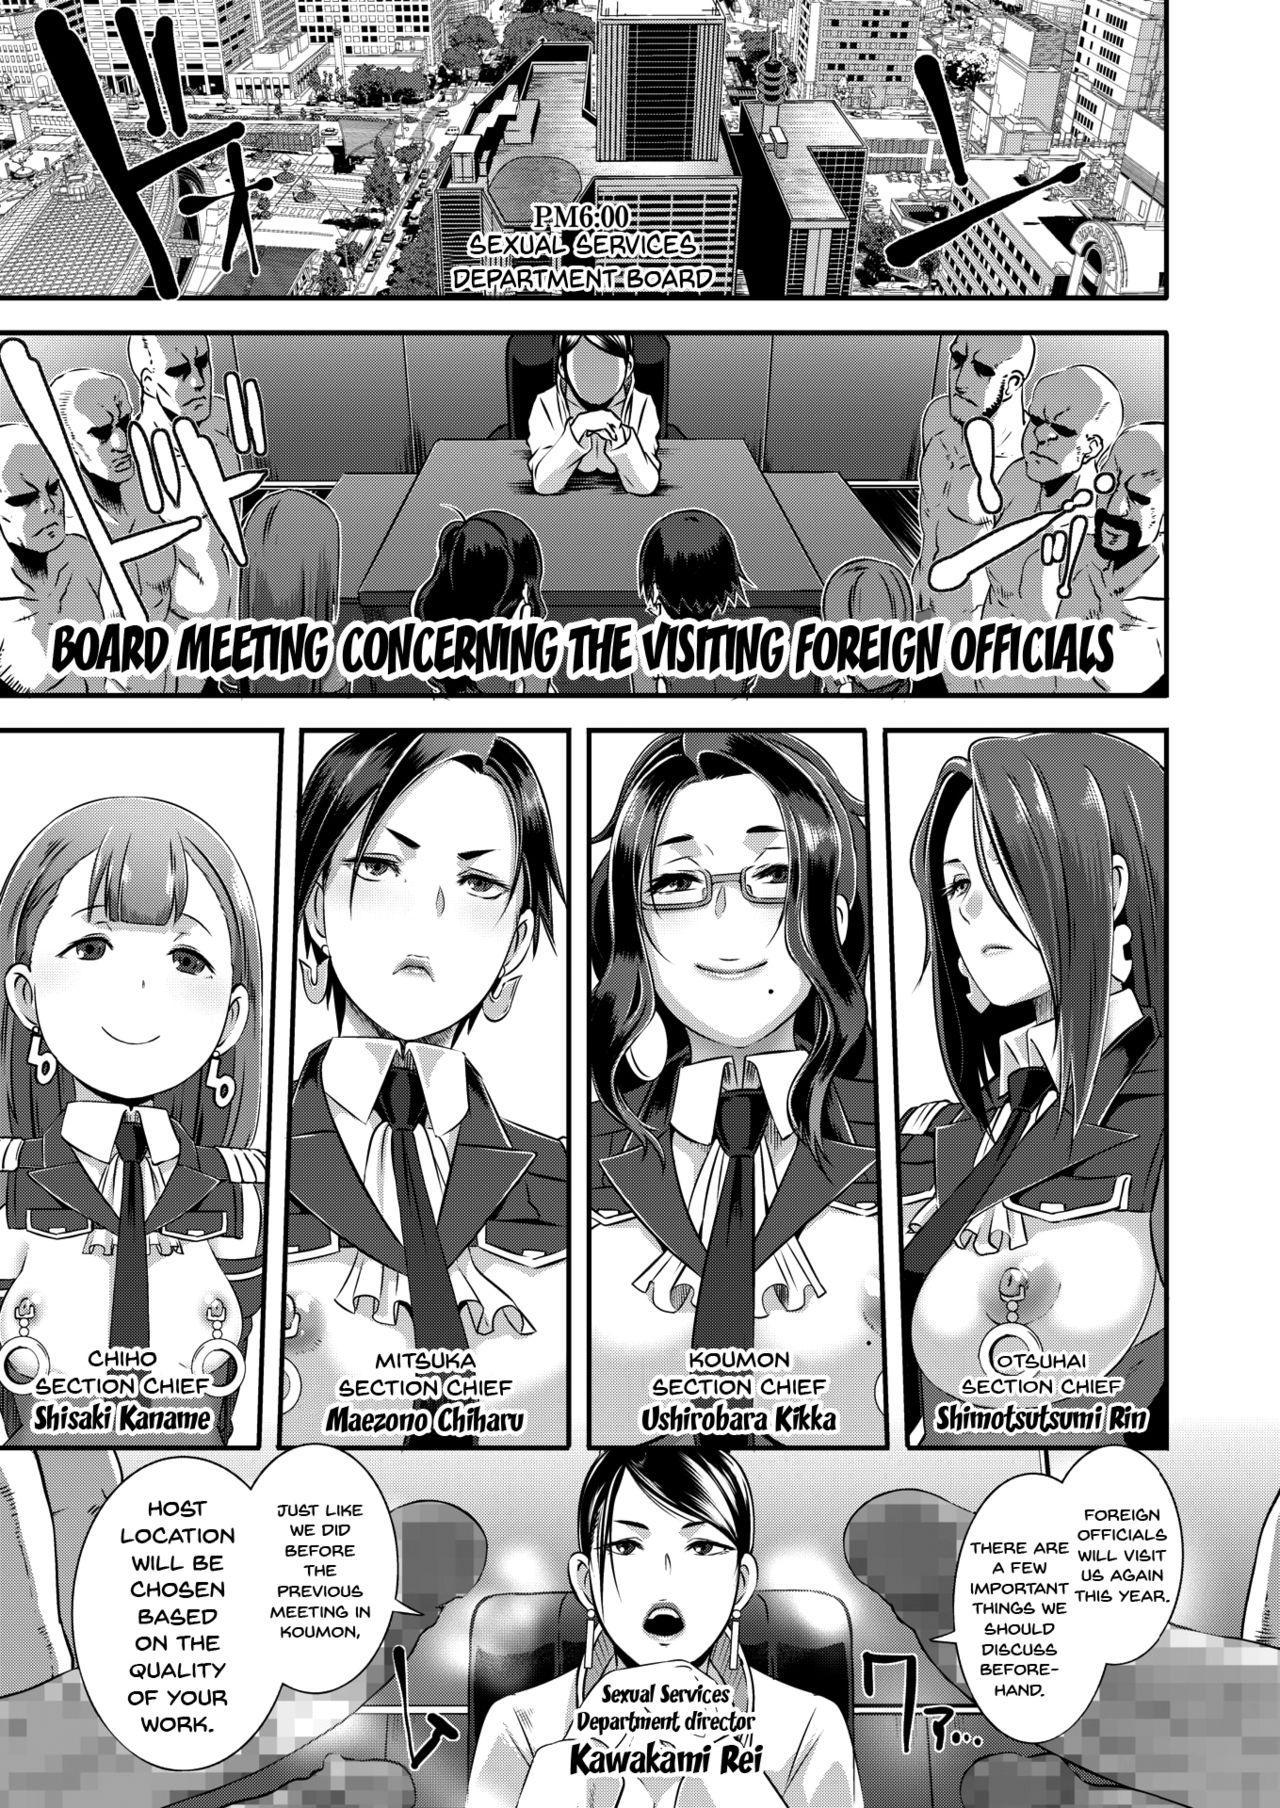 [Butcha-U] SDPO ~Seimukan no Susume~ | SDPO ~Sexual Desire Processing Officer~ (COMIC Megastore Alpha 2017-09) [English] [Doujins.com] [Digital] 12